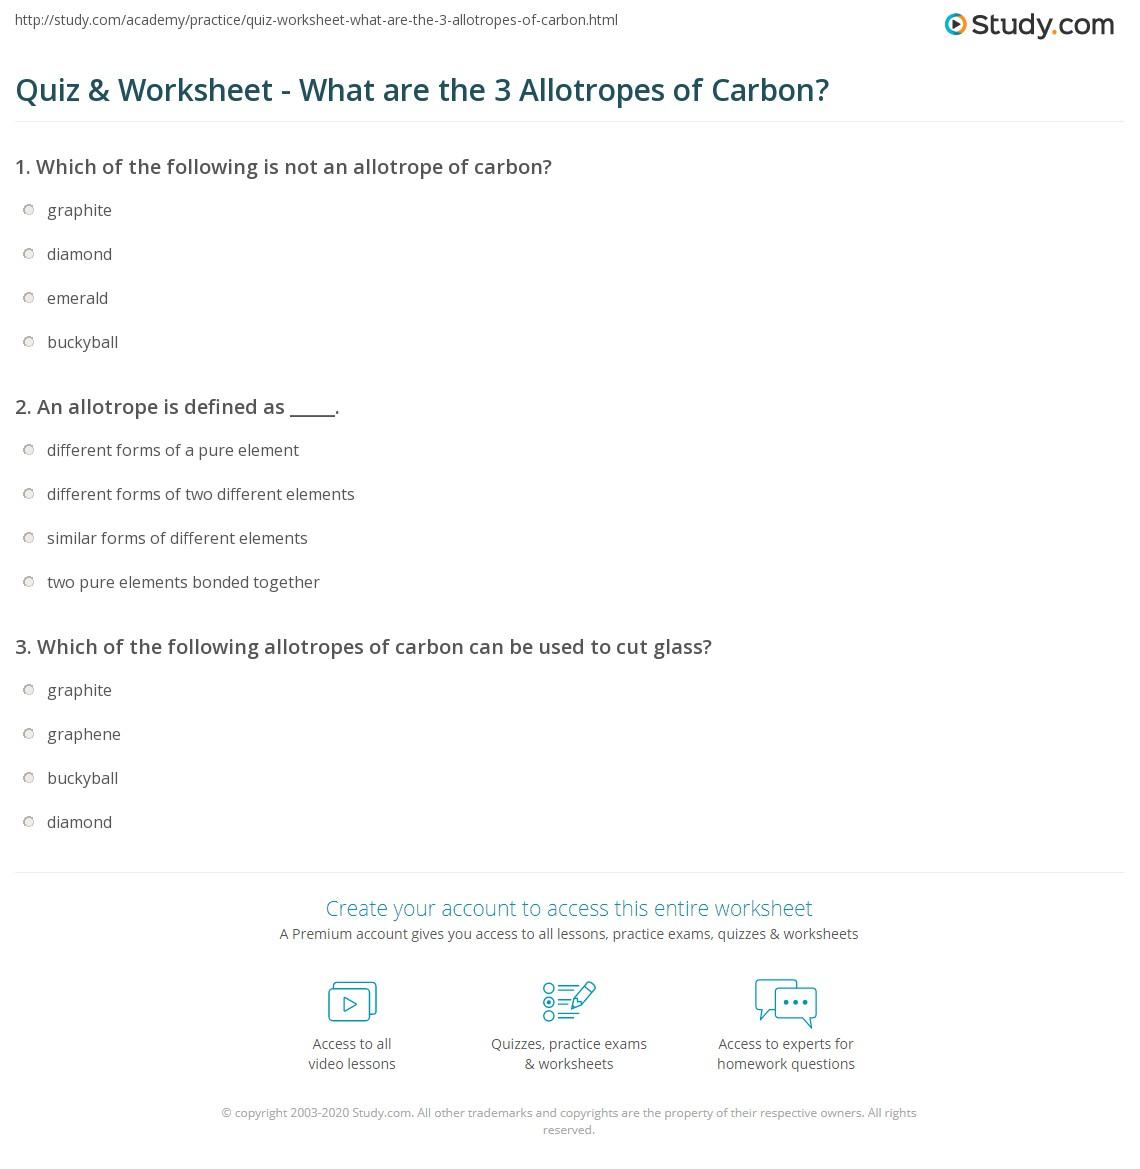 The Allotropes Of Carbon Allotropes Of Carbon 02 20